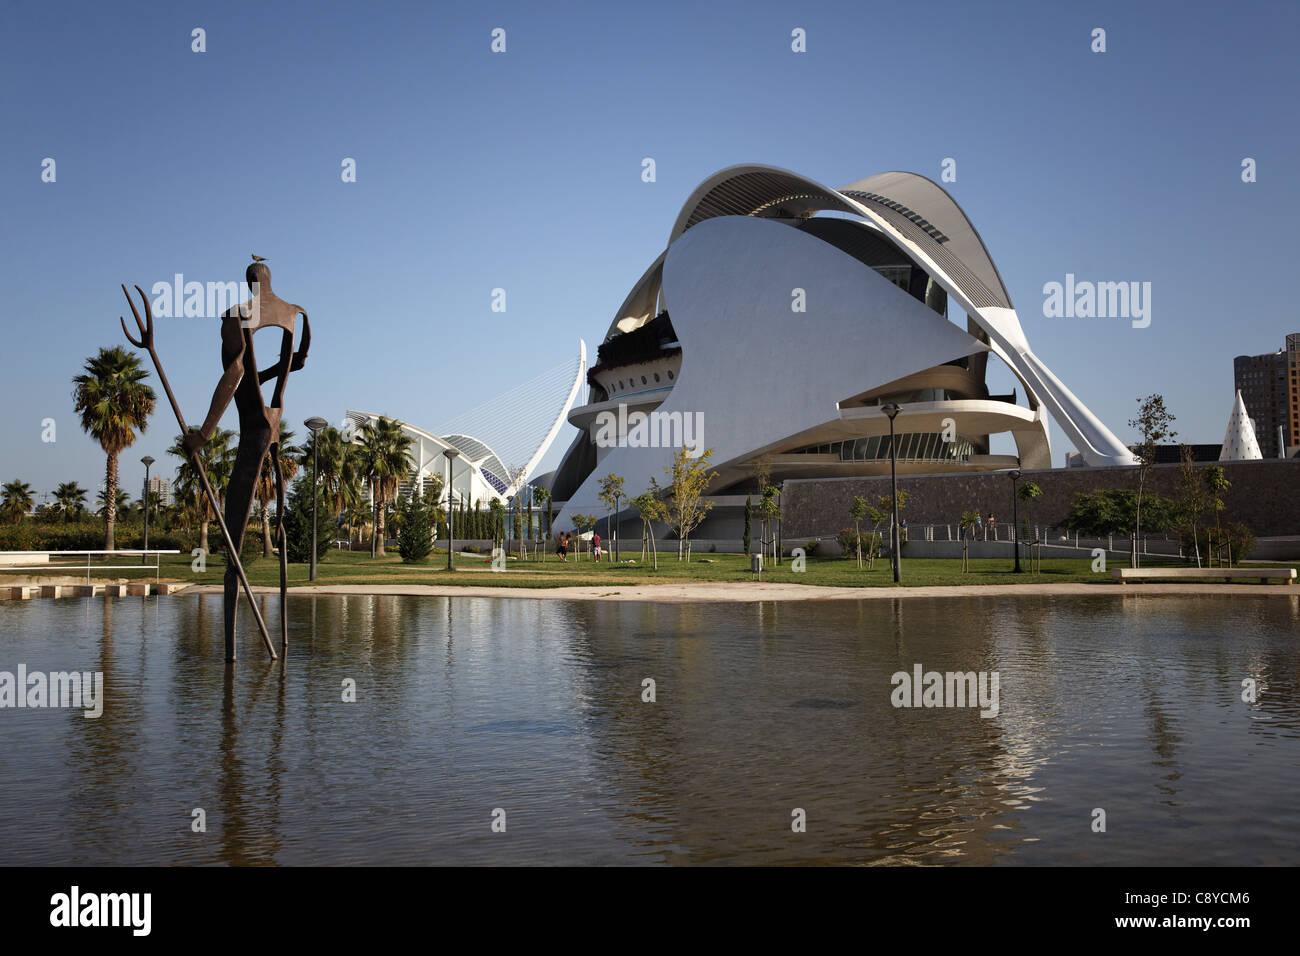 Le Palau de les Arts Reina Sofia par Calatrava , Valencia, Espagne Banque D'Images